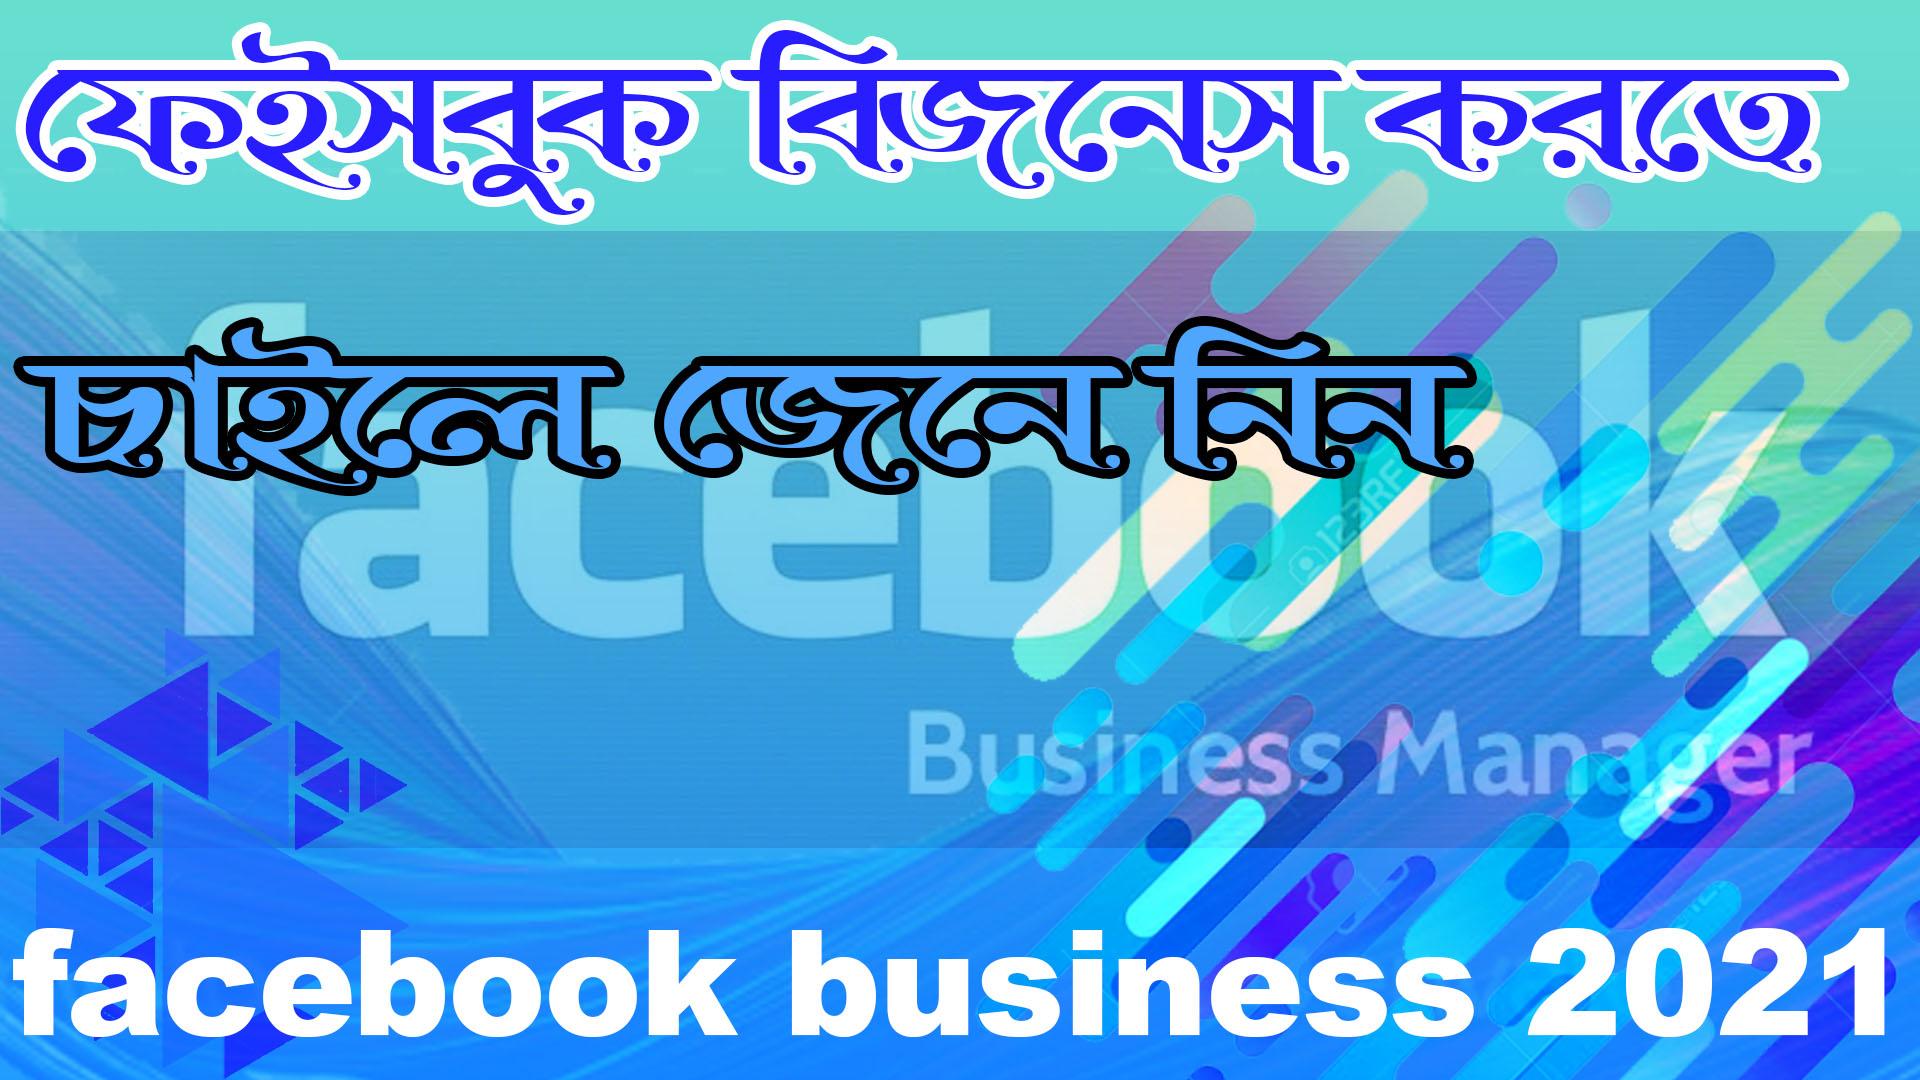 Facebook business tips 2021